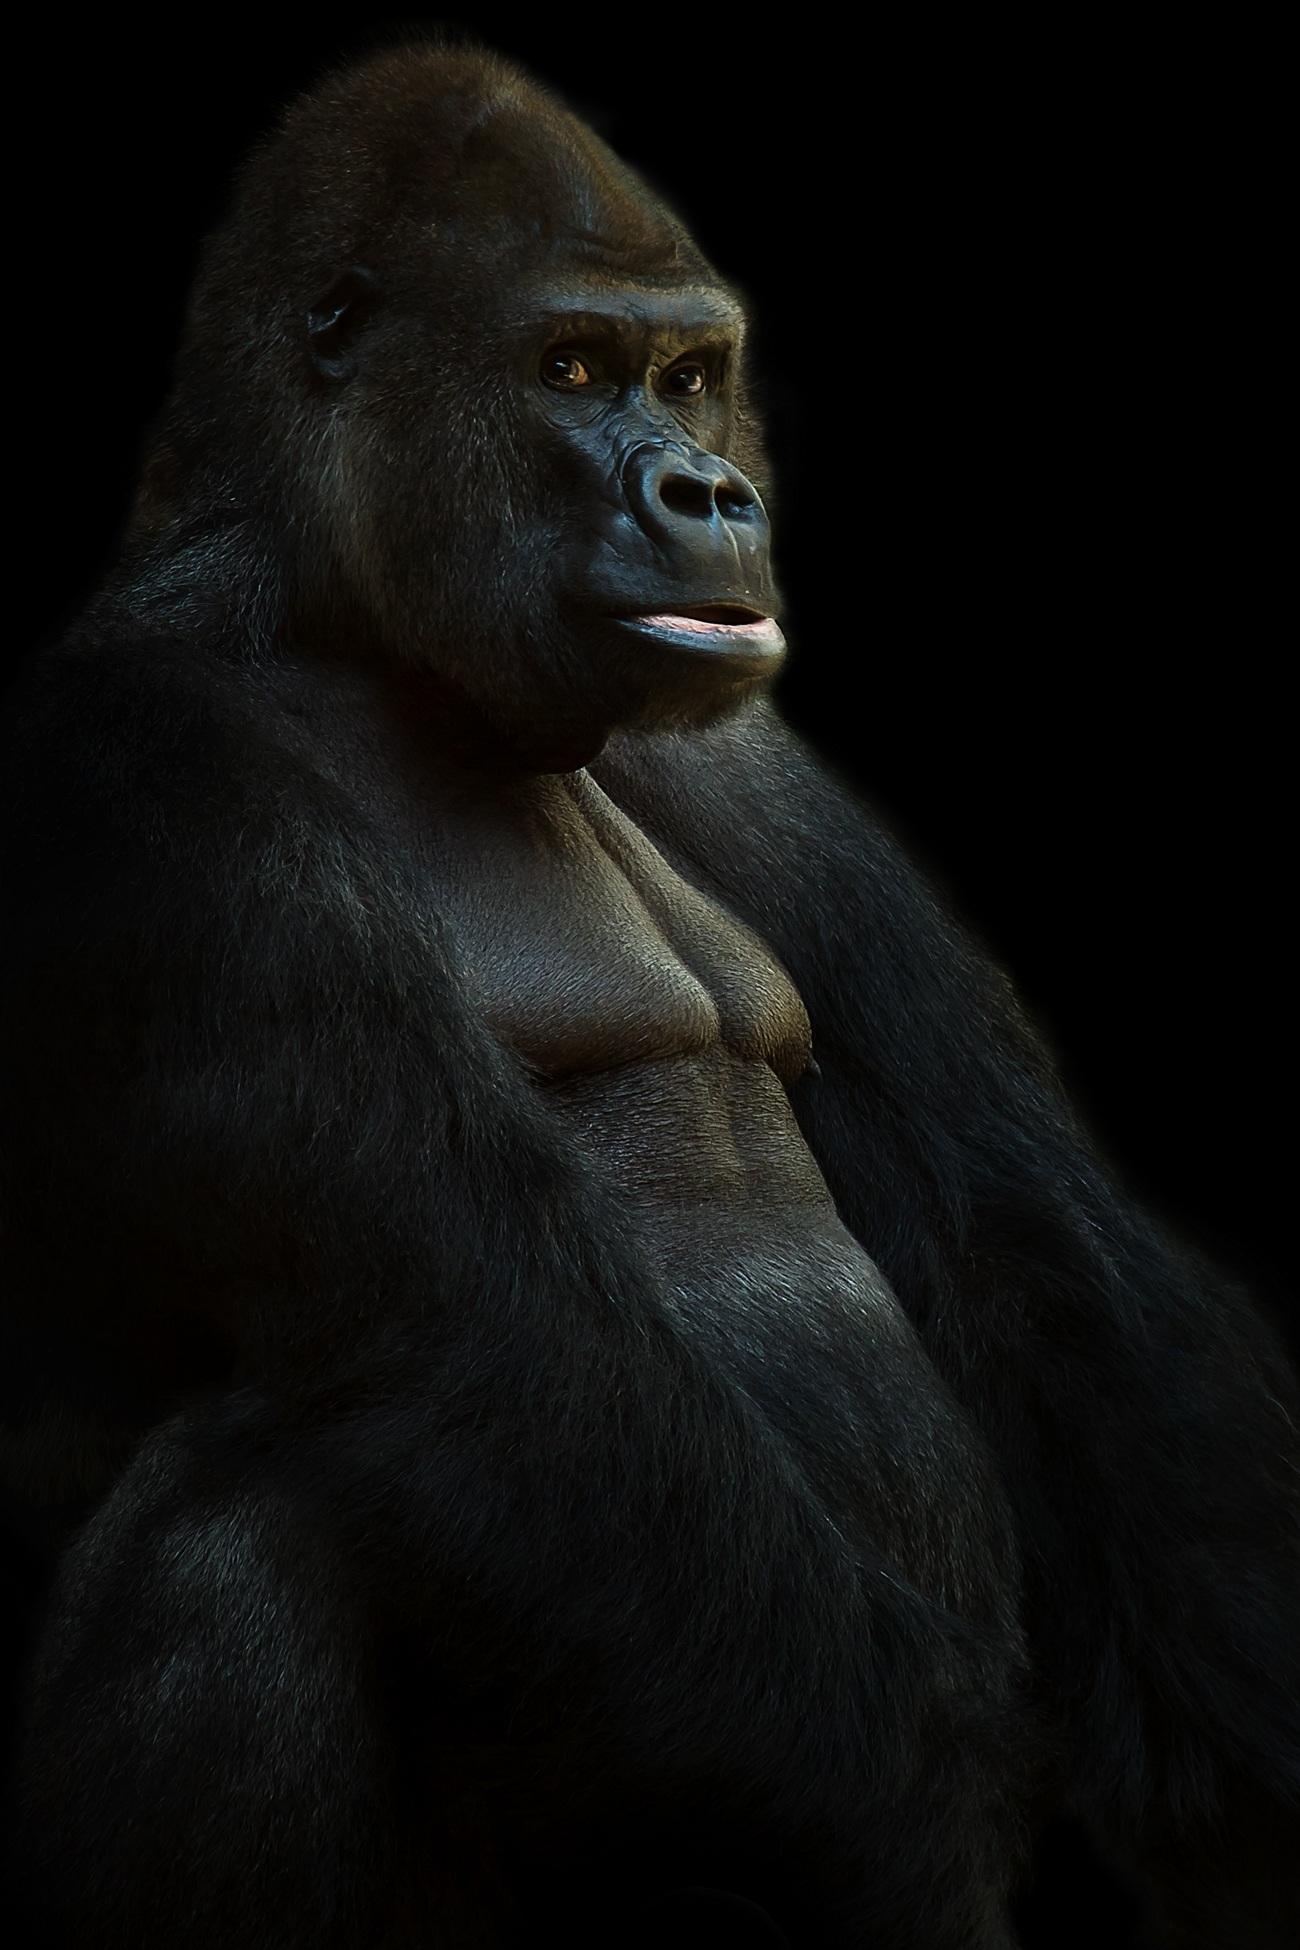 free stock photos of gorilla pexels